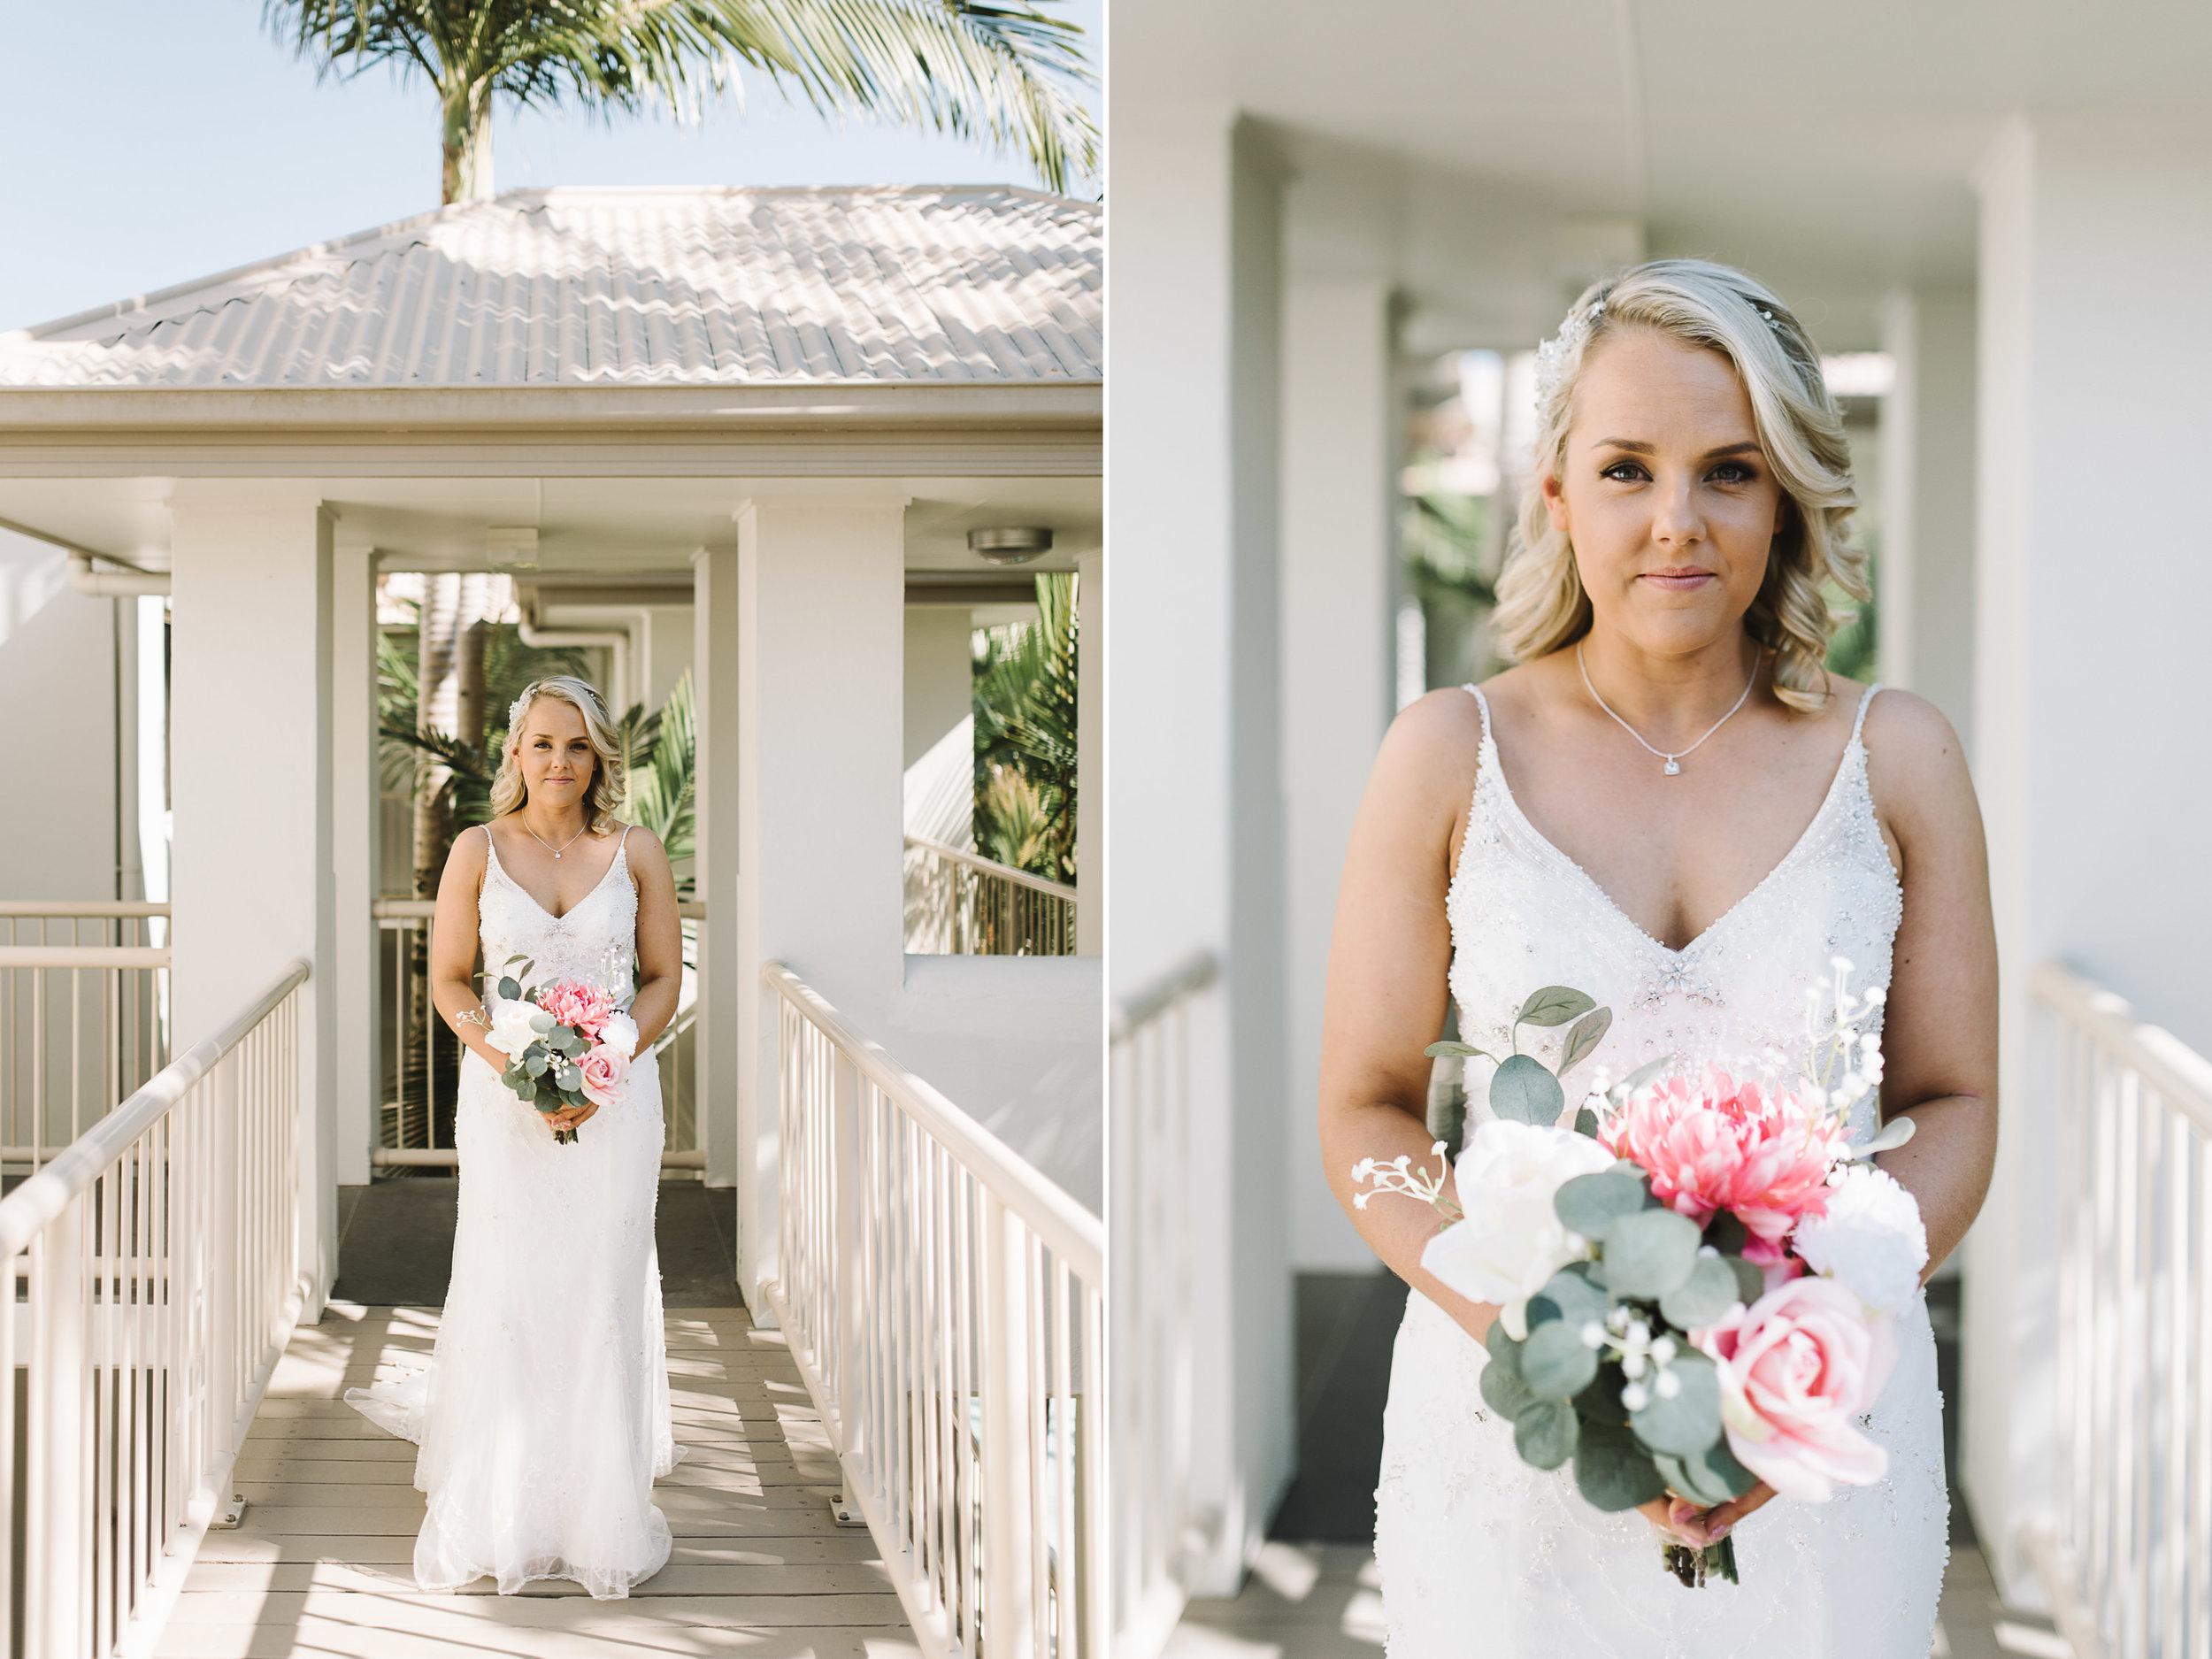 Queensland-Beach-Wedding-7.jpg